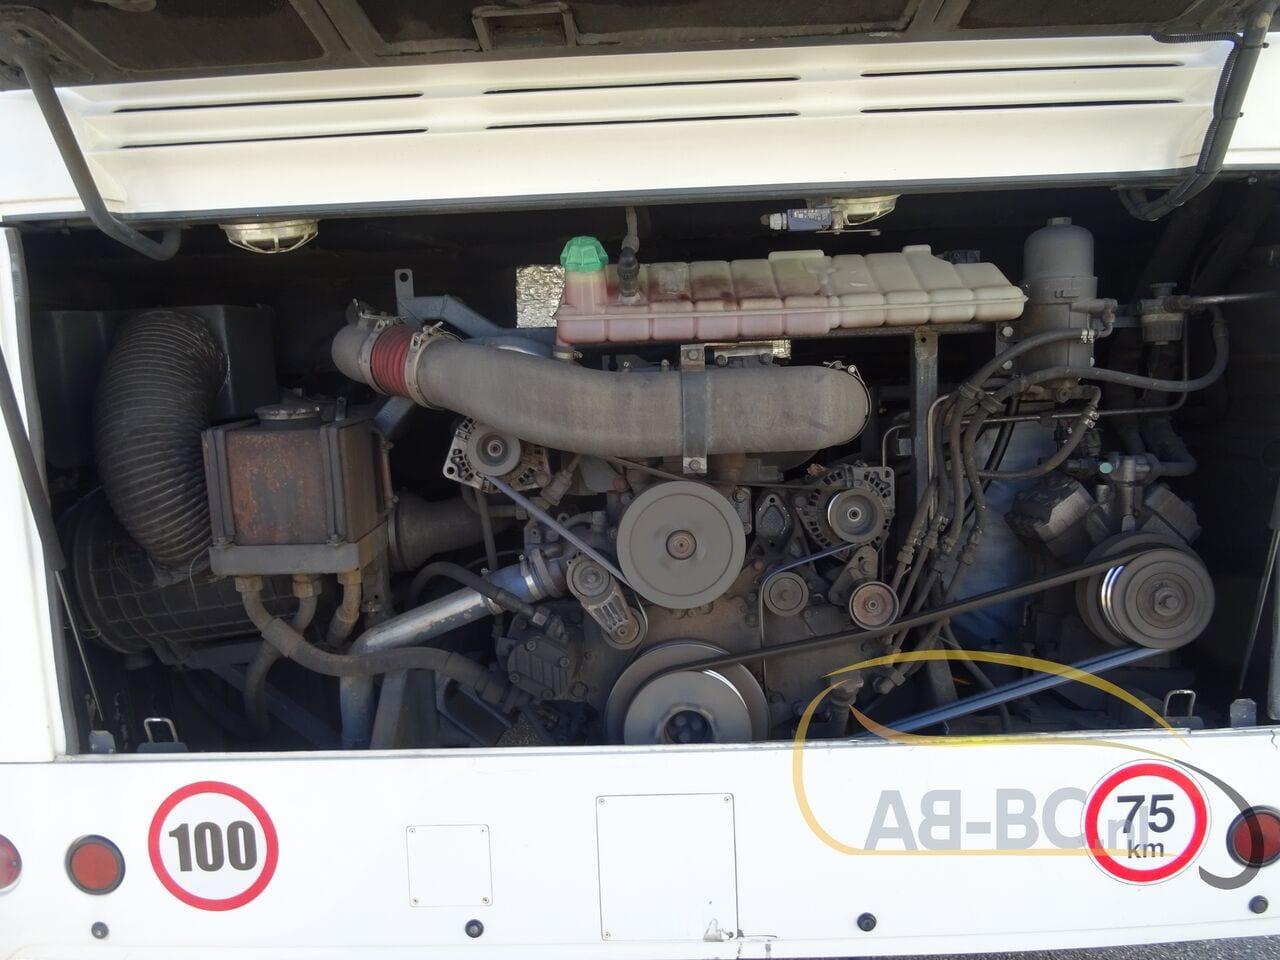 coach-busTEMSA-Safari-RD-53-Seats-DAF-Motor-12-mtr---1616166503065893825_big_befaa4bd93736e89eb23b15d9939ec0d--21031917053743807500